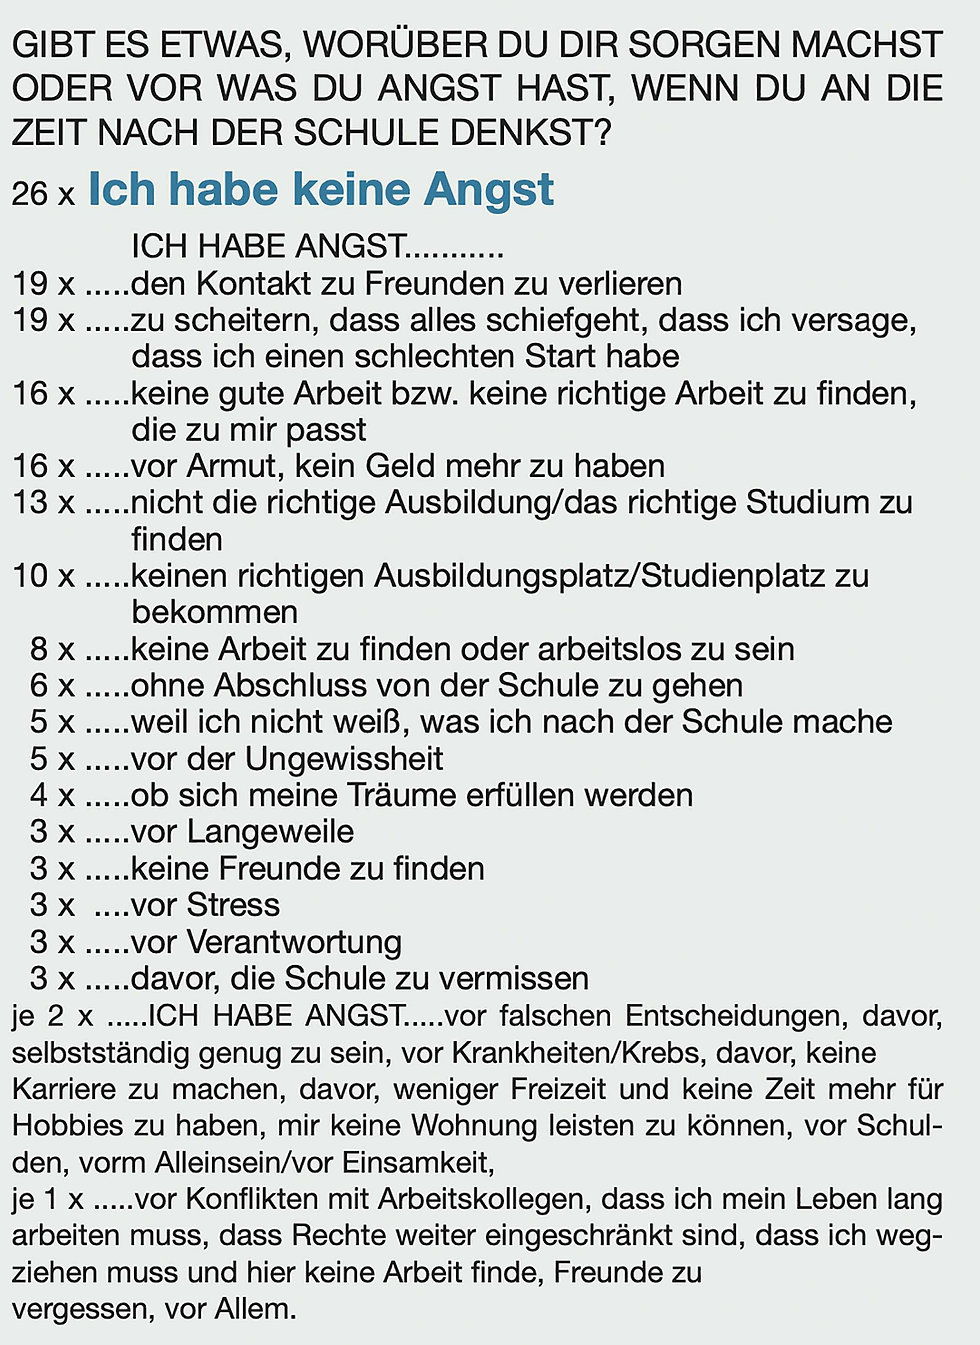 ANGST Text.jpg